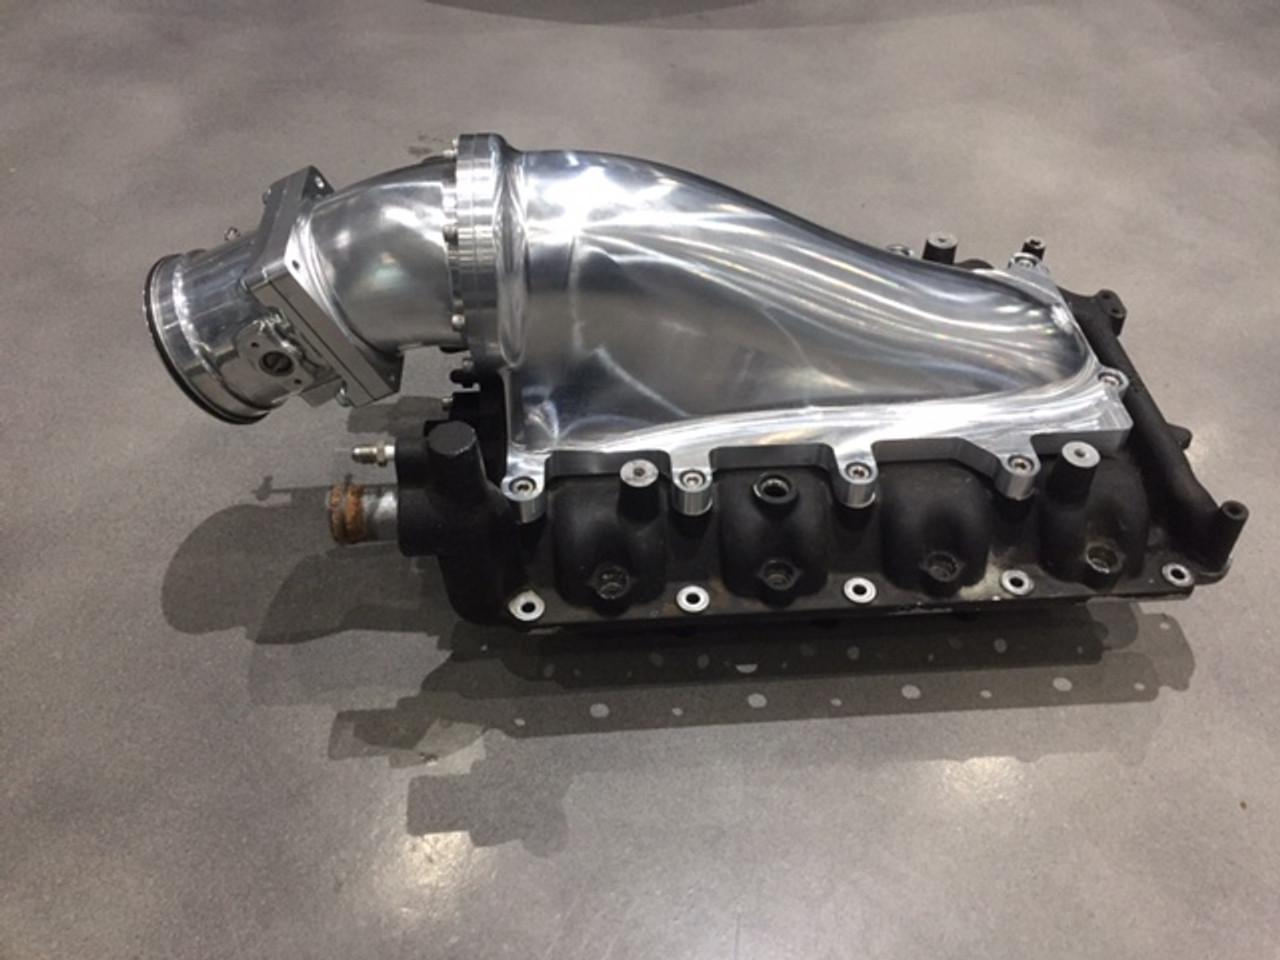 Billet 5.4 GT500 Upper Intake